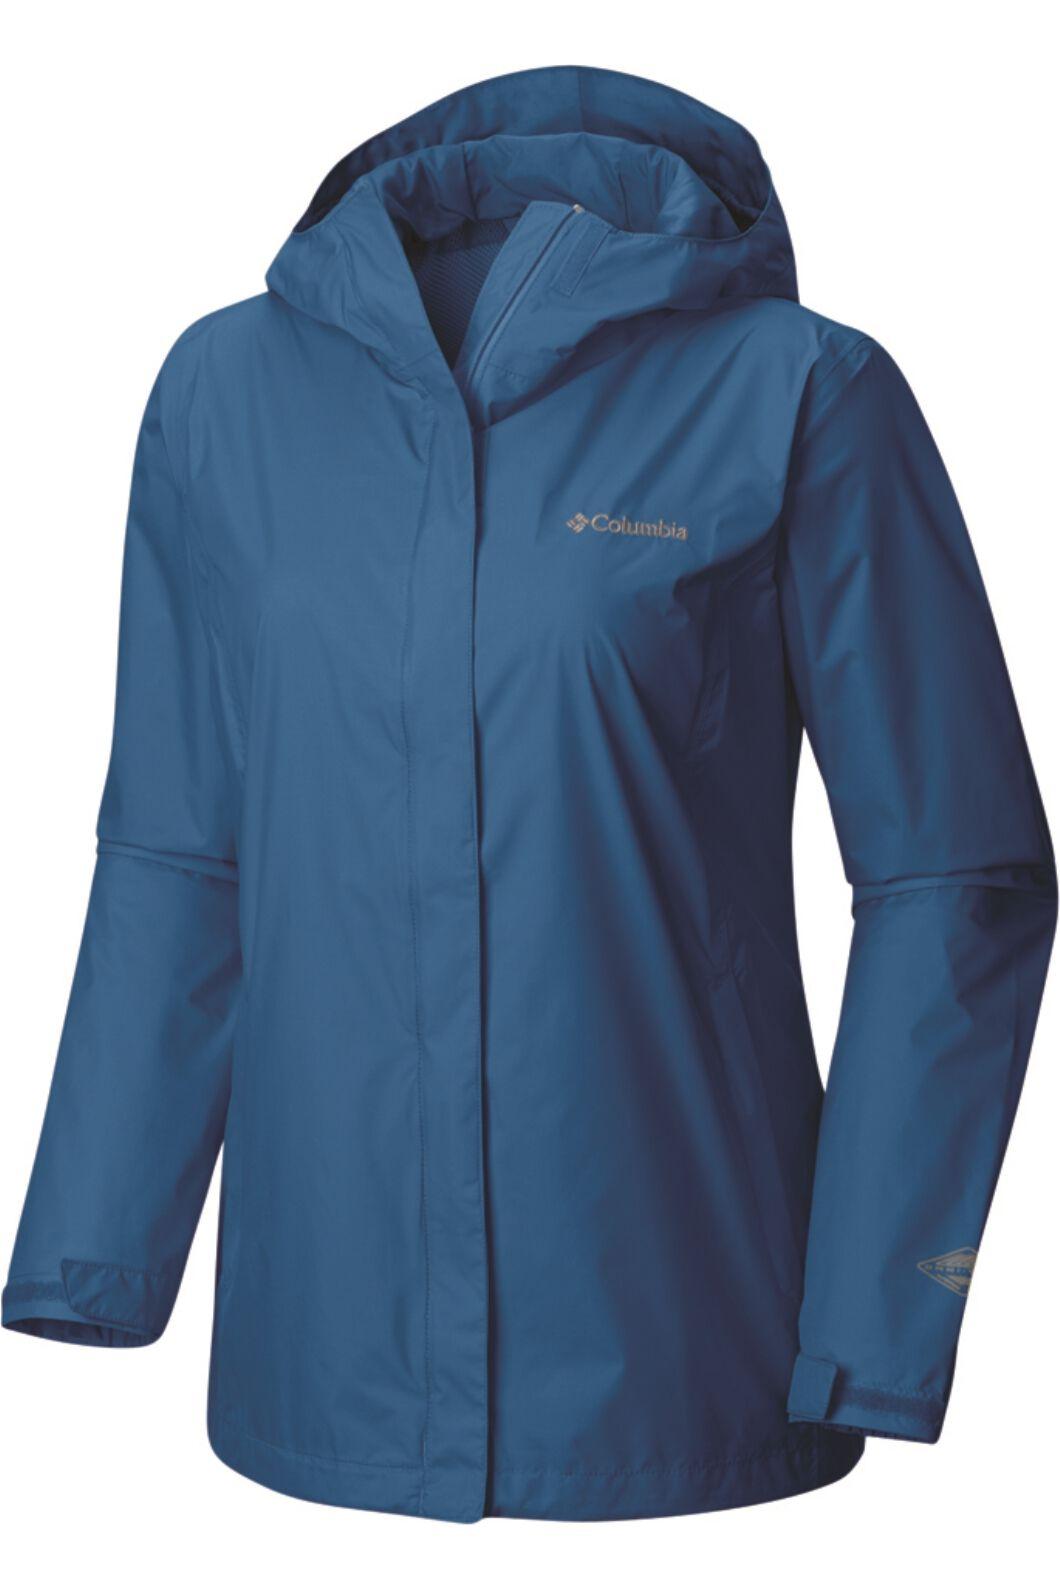 Columbia Women's Arcadia II Jacket, DARK CYAN, hi-res